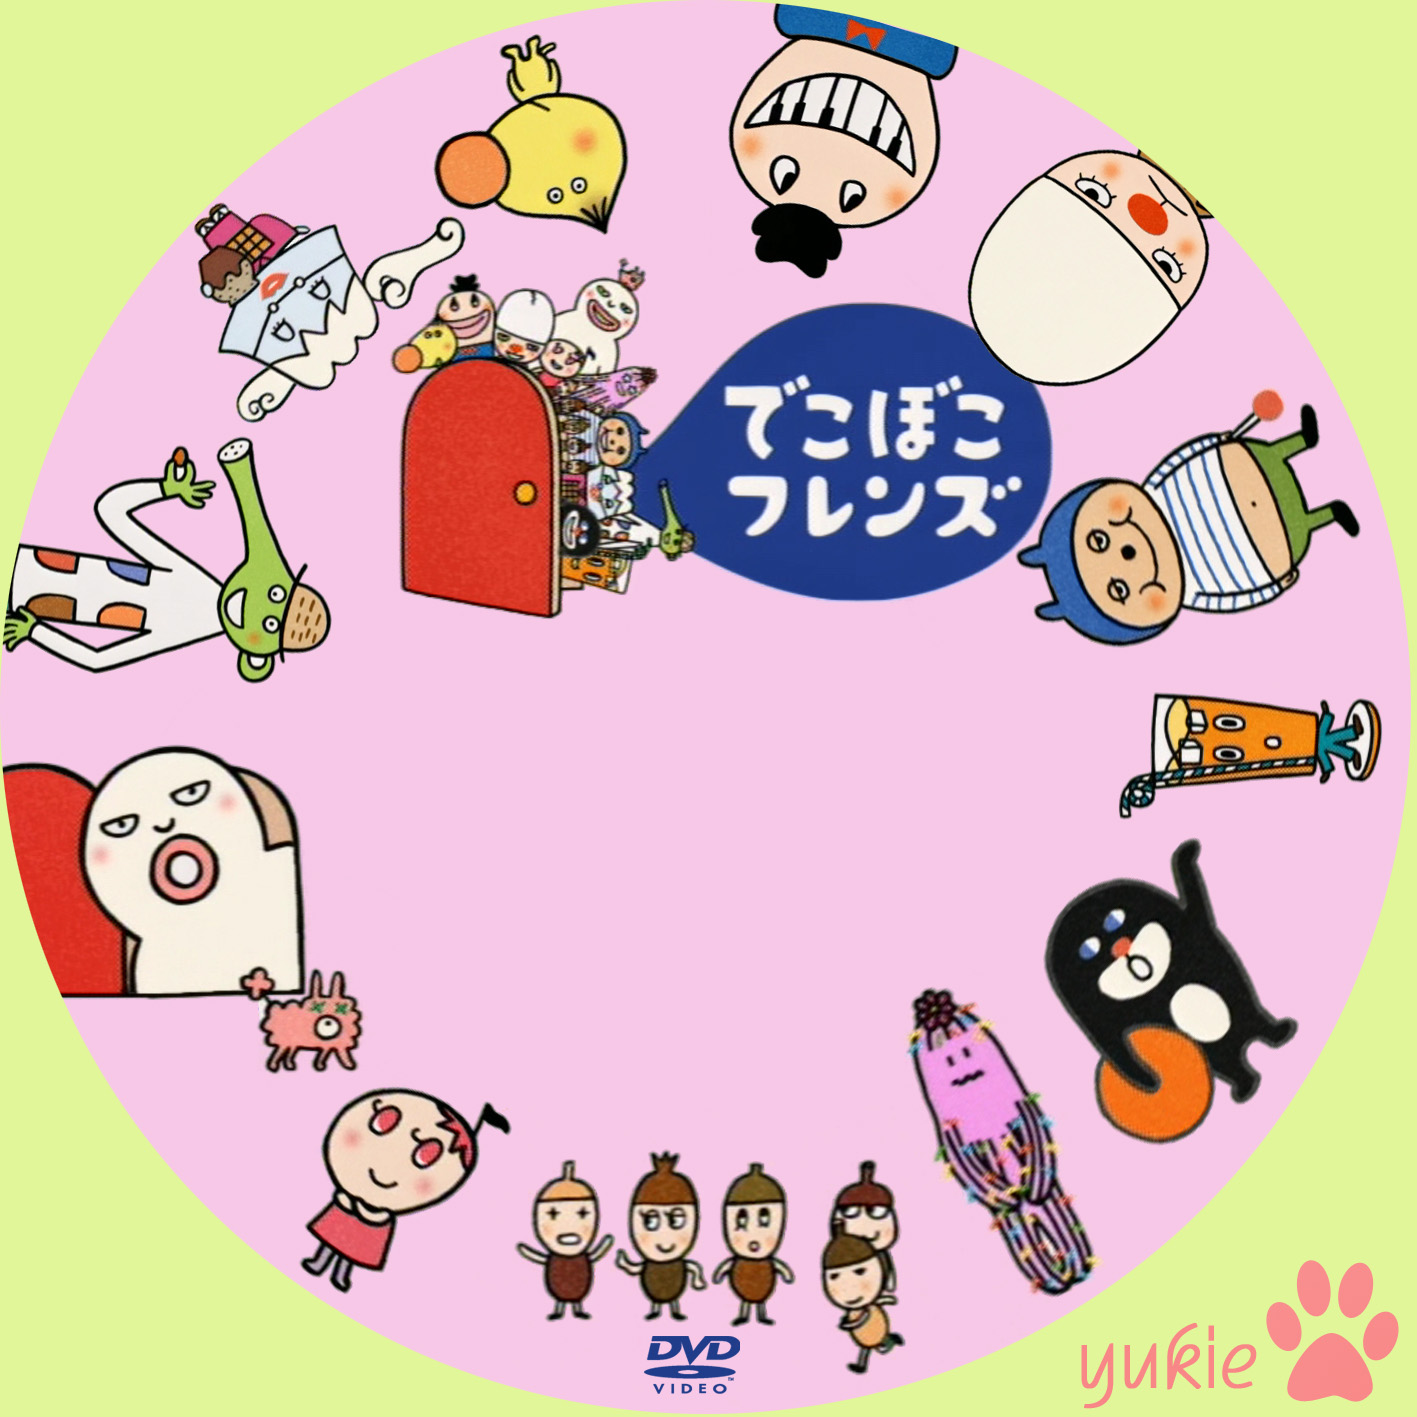 YUKIEのラベル作り♪ でこぼこ ... : 名前ラベルシール : すべての講義